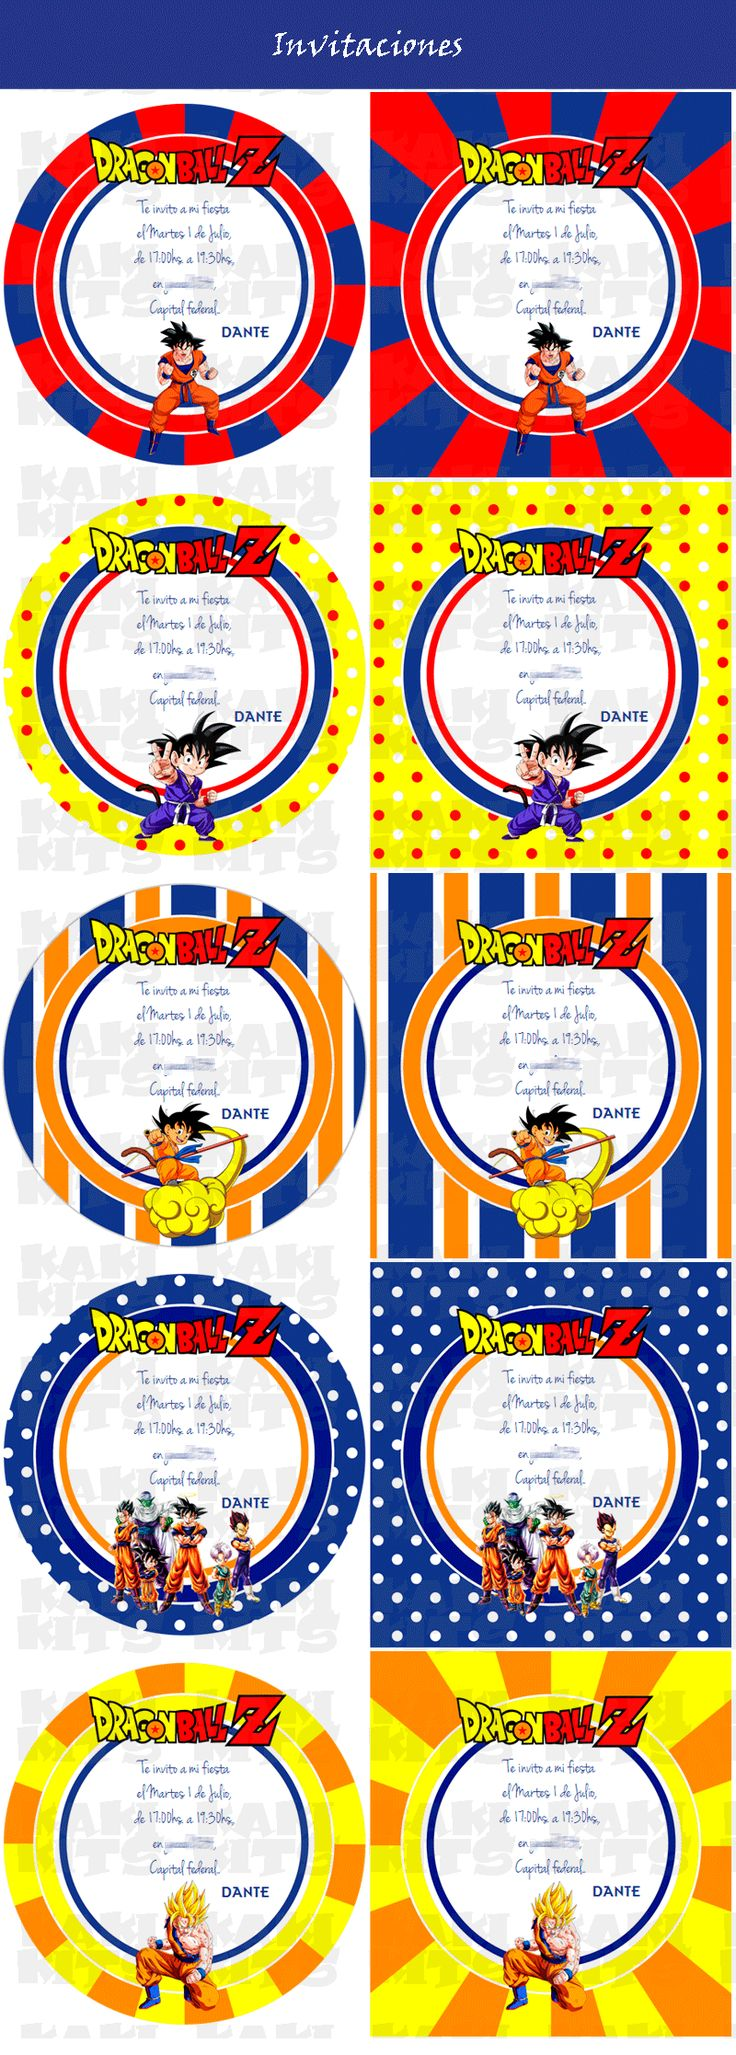 Kit Imprimible Dragon Ball Z Candy Bar Invitaciones Deco - $ 67,00